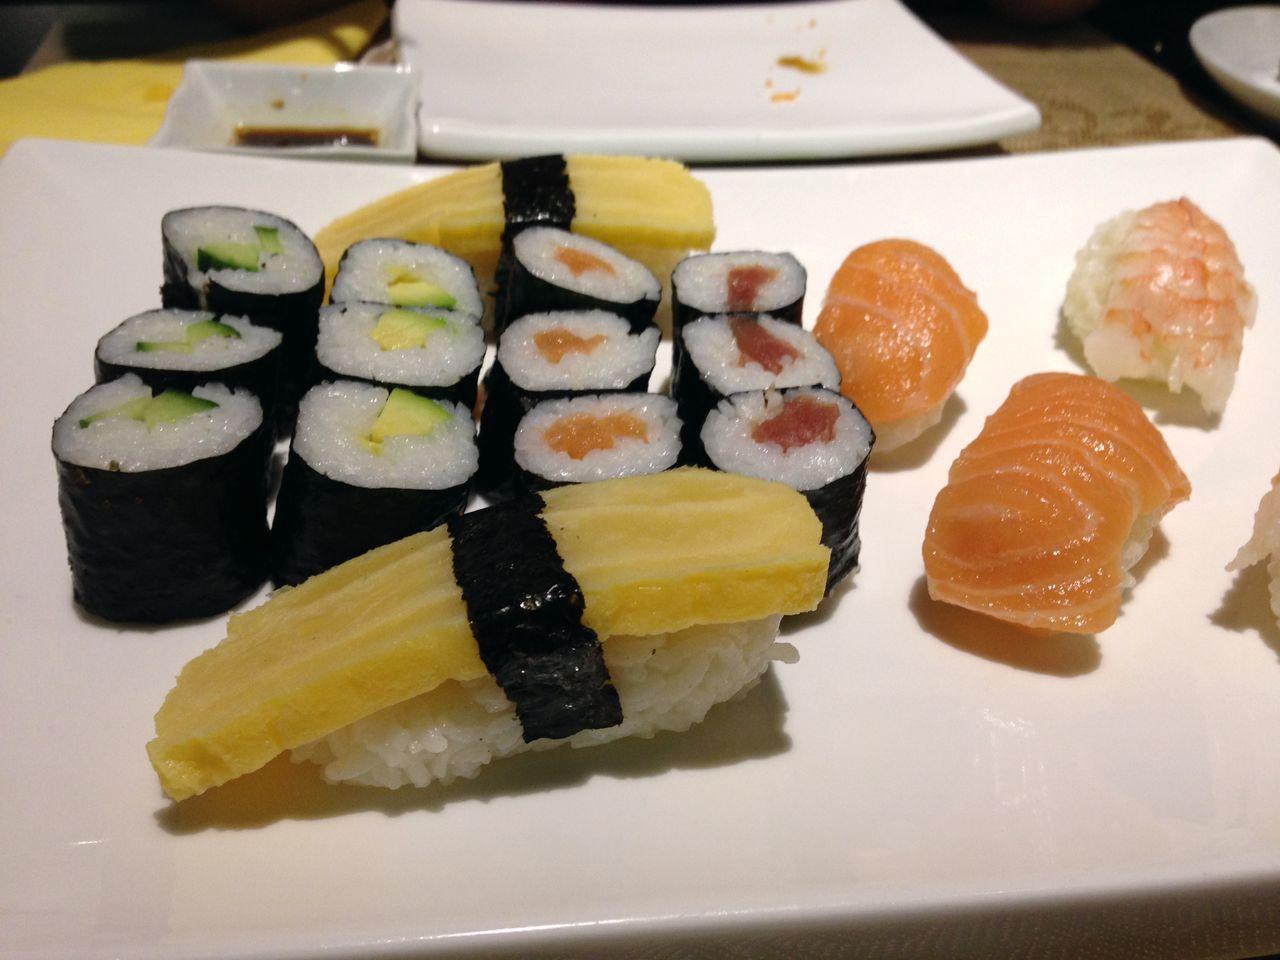 Food Foodporn Freshness Healthy Eating Maki Nigiri Sushi No People Ready-to-eat Sushi Sushi Time Sushi!